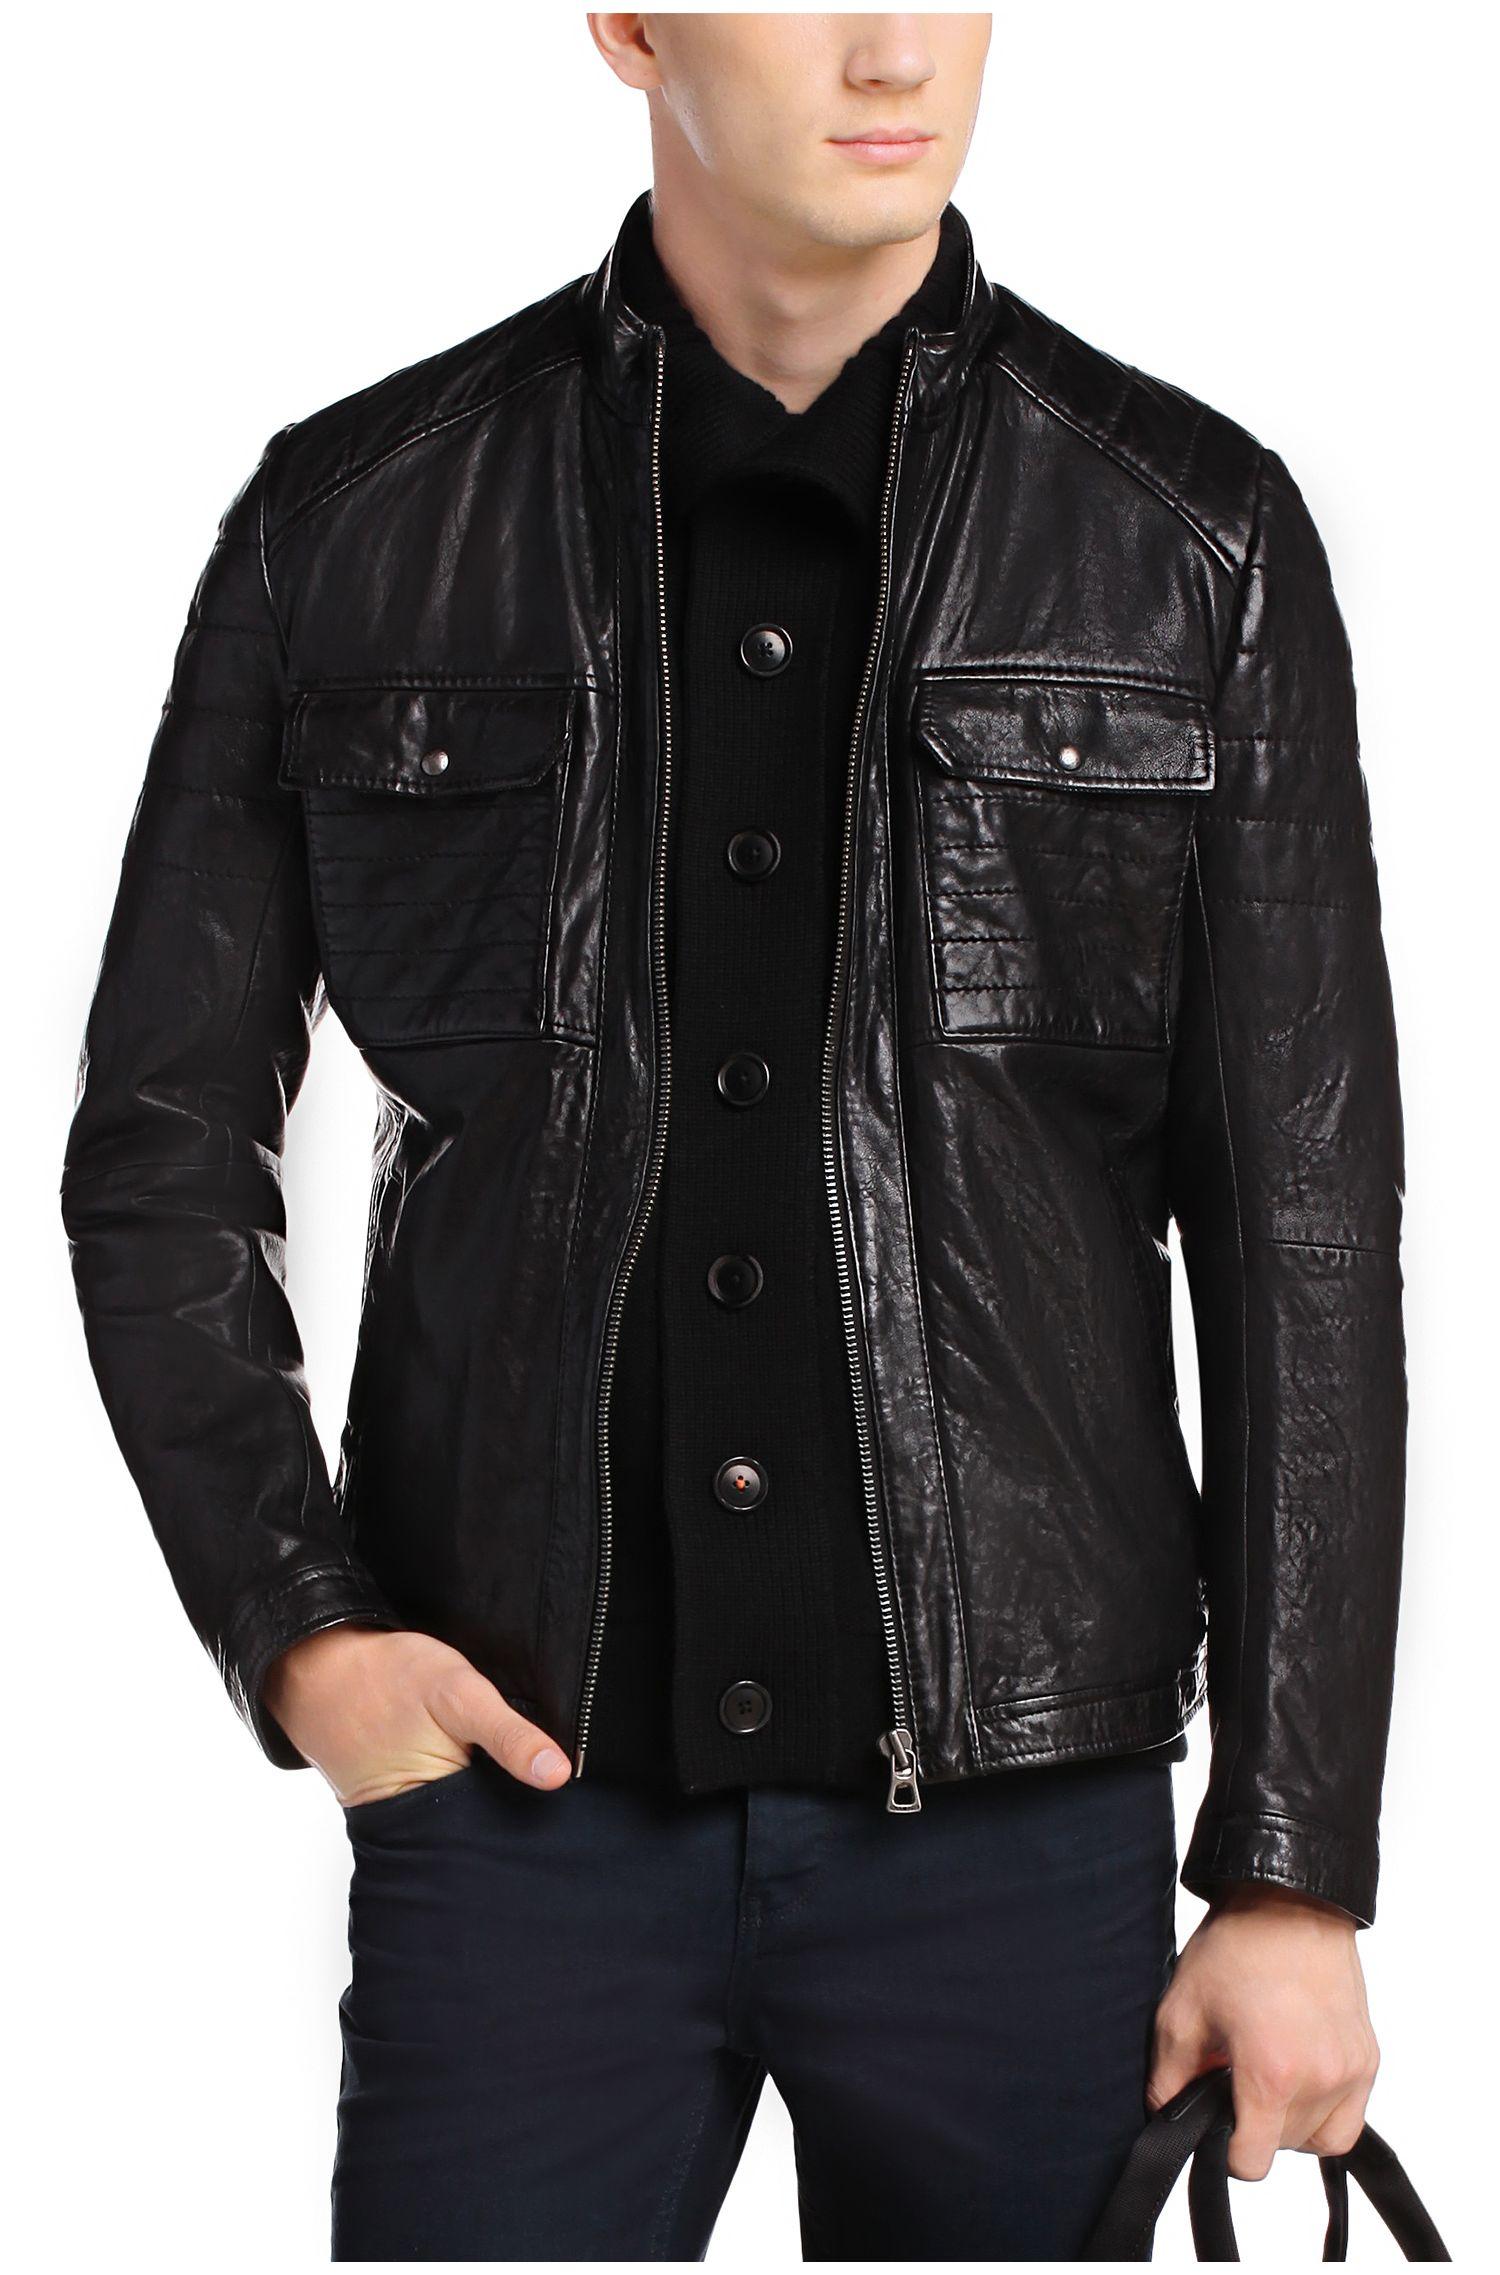 hugo boss ladies leather jacket. Black Bedroom Furniture Sets. Home Design Ideas